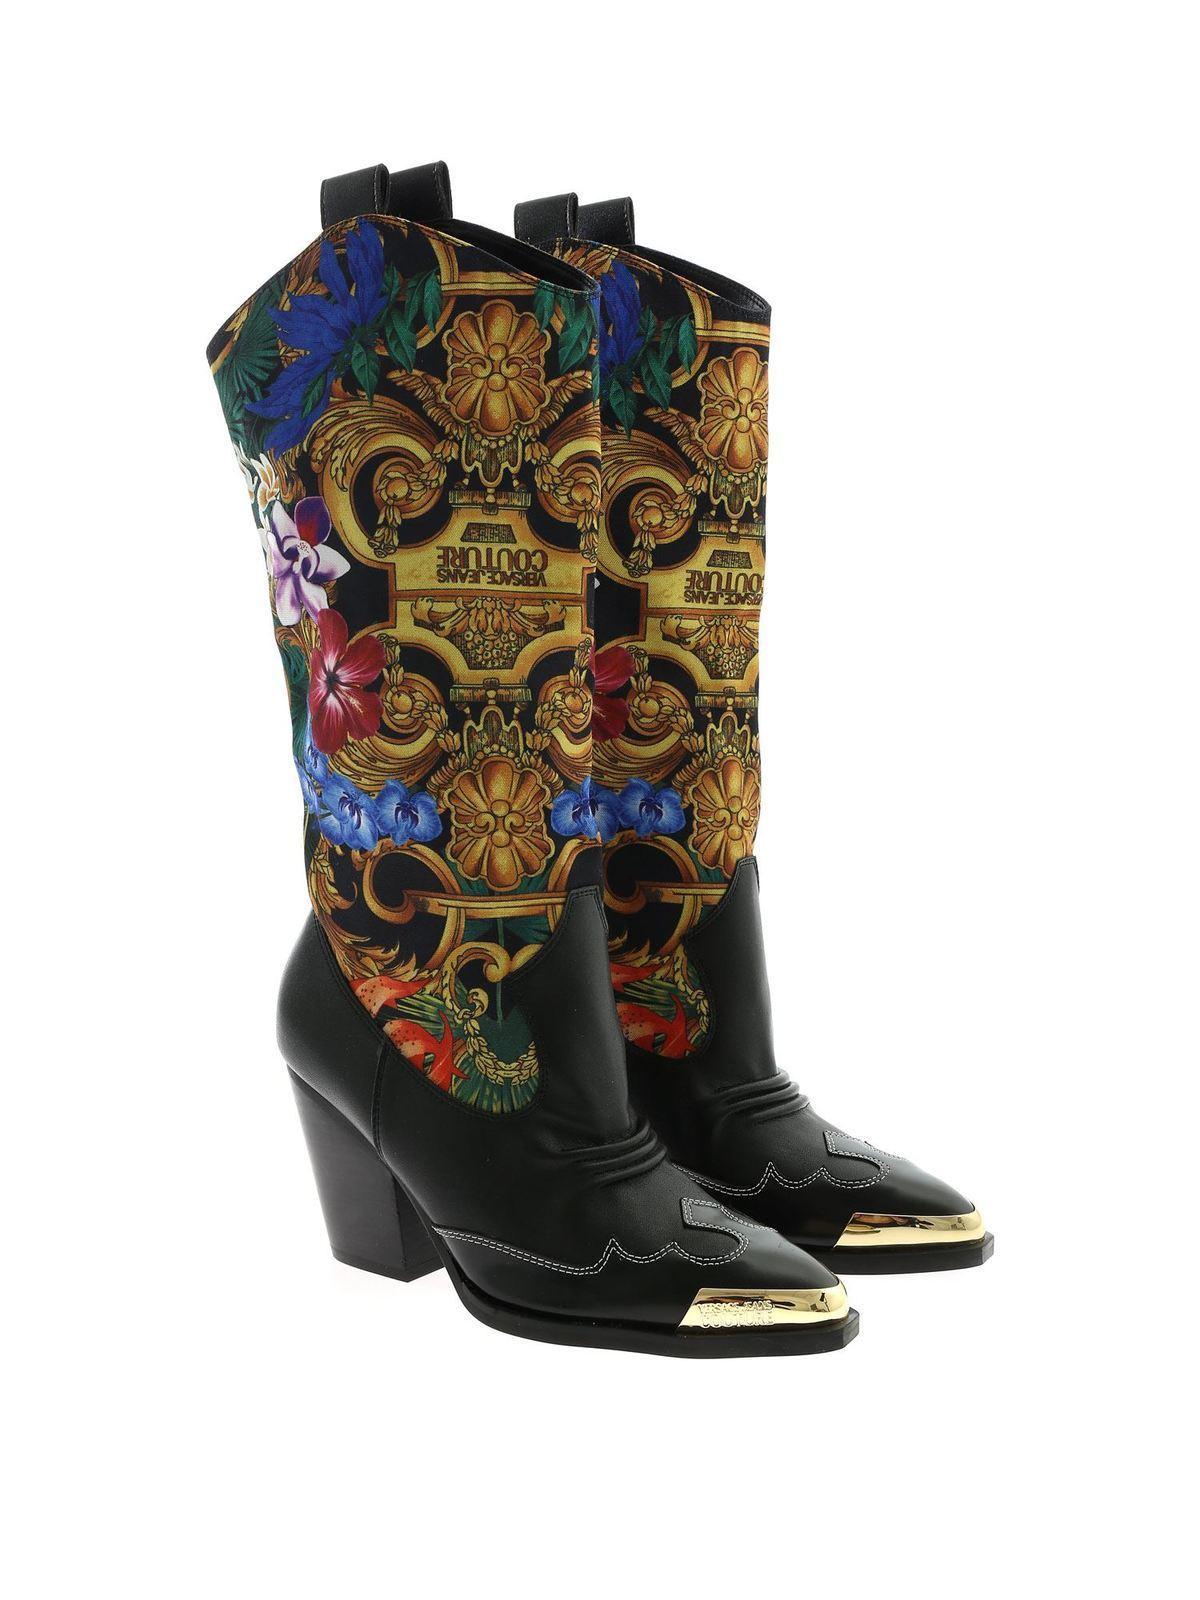 Versace Jeans Couture Stivali neri con stampa Tropical